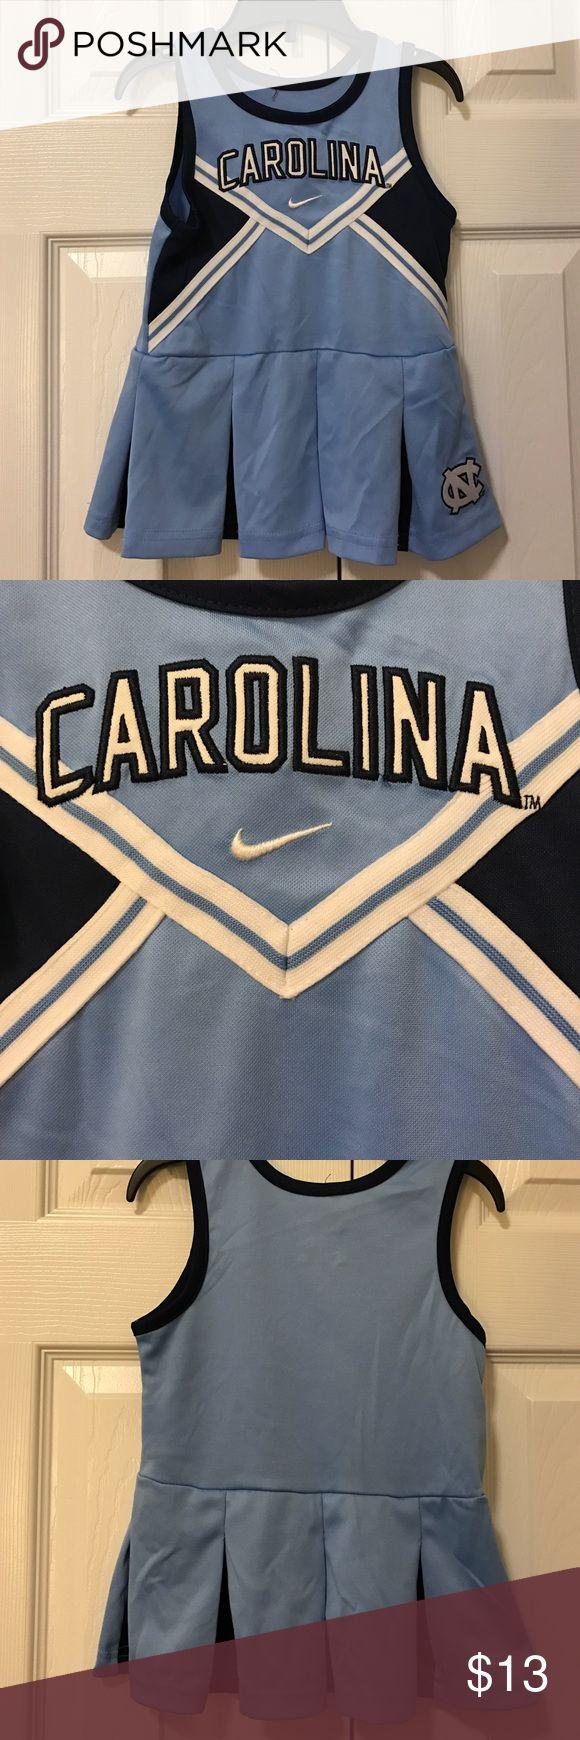 Tiny tots Nike Tar Heel Carolina cheerleader 2t Carolina blue cheerleader dress Nike size 2t Nike Dresses Casual